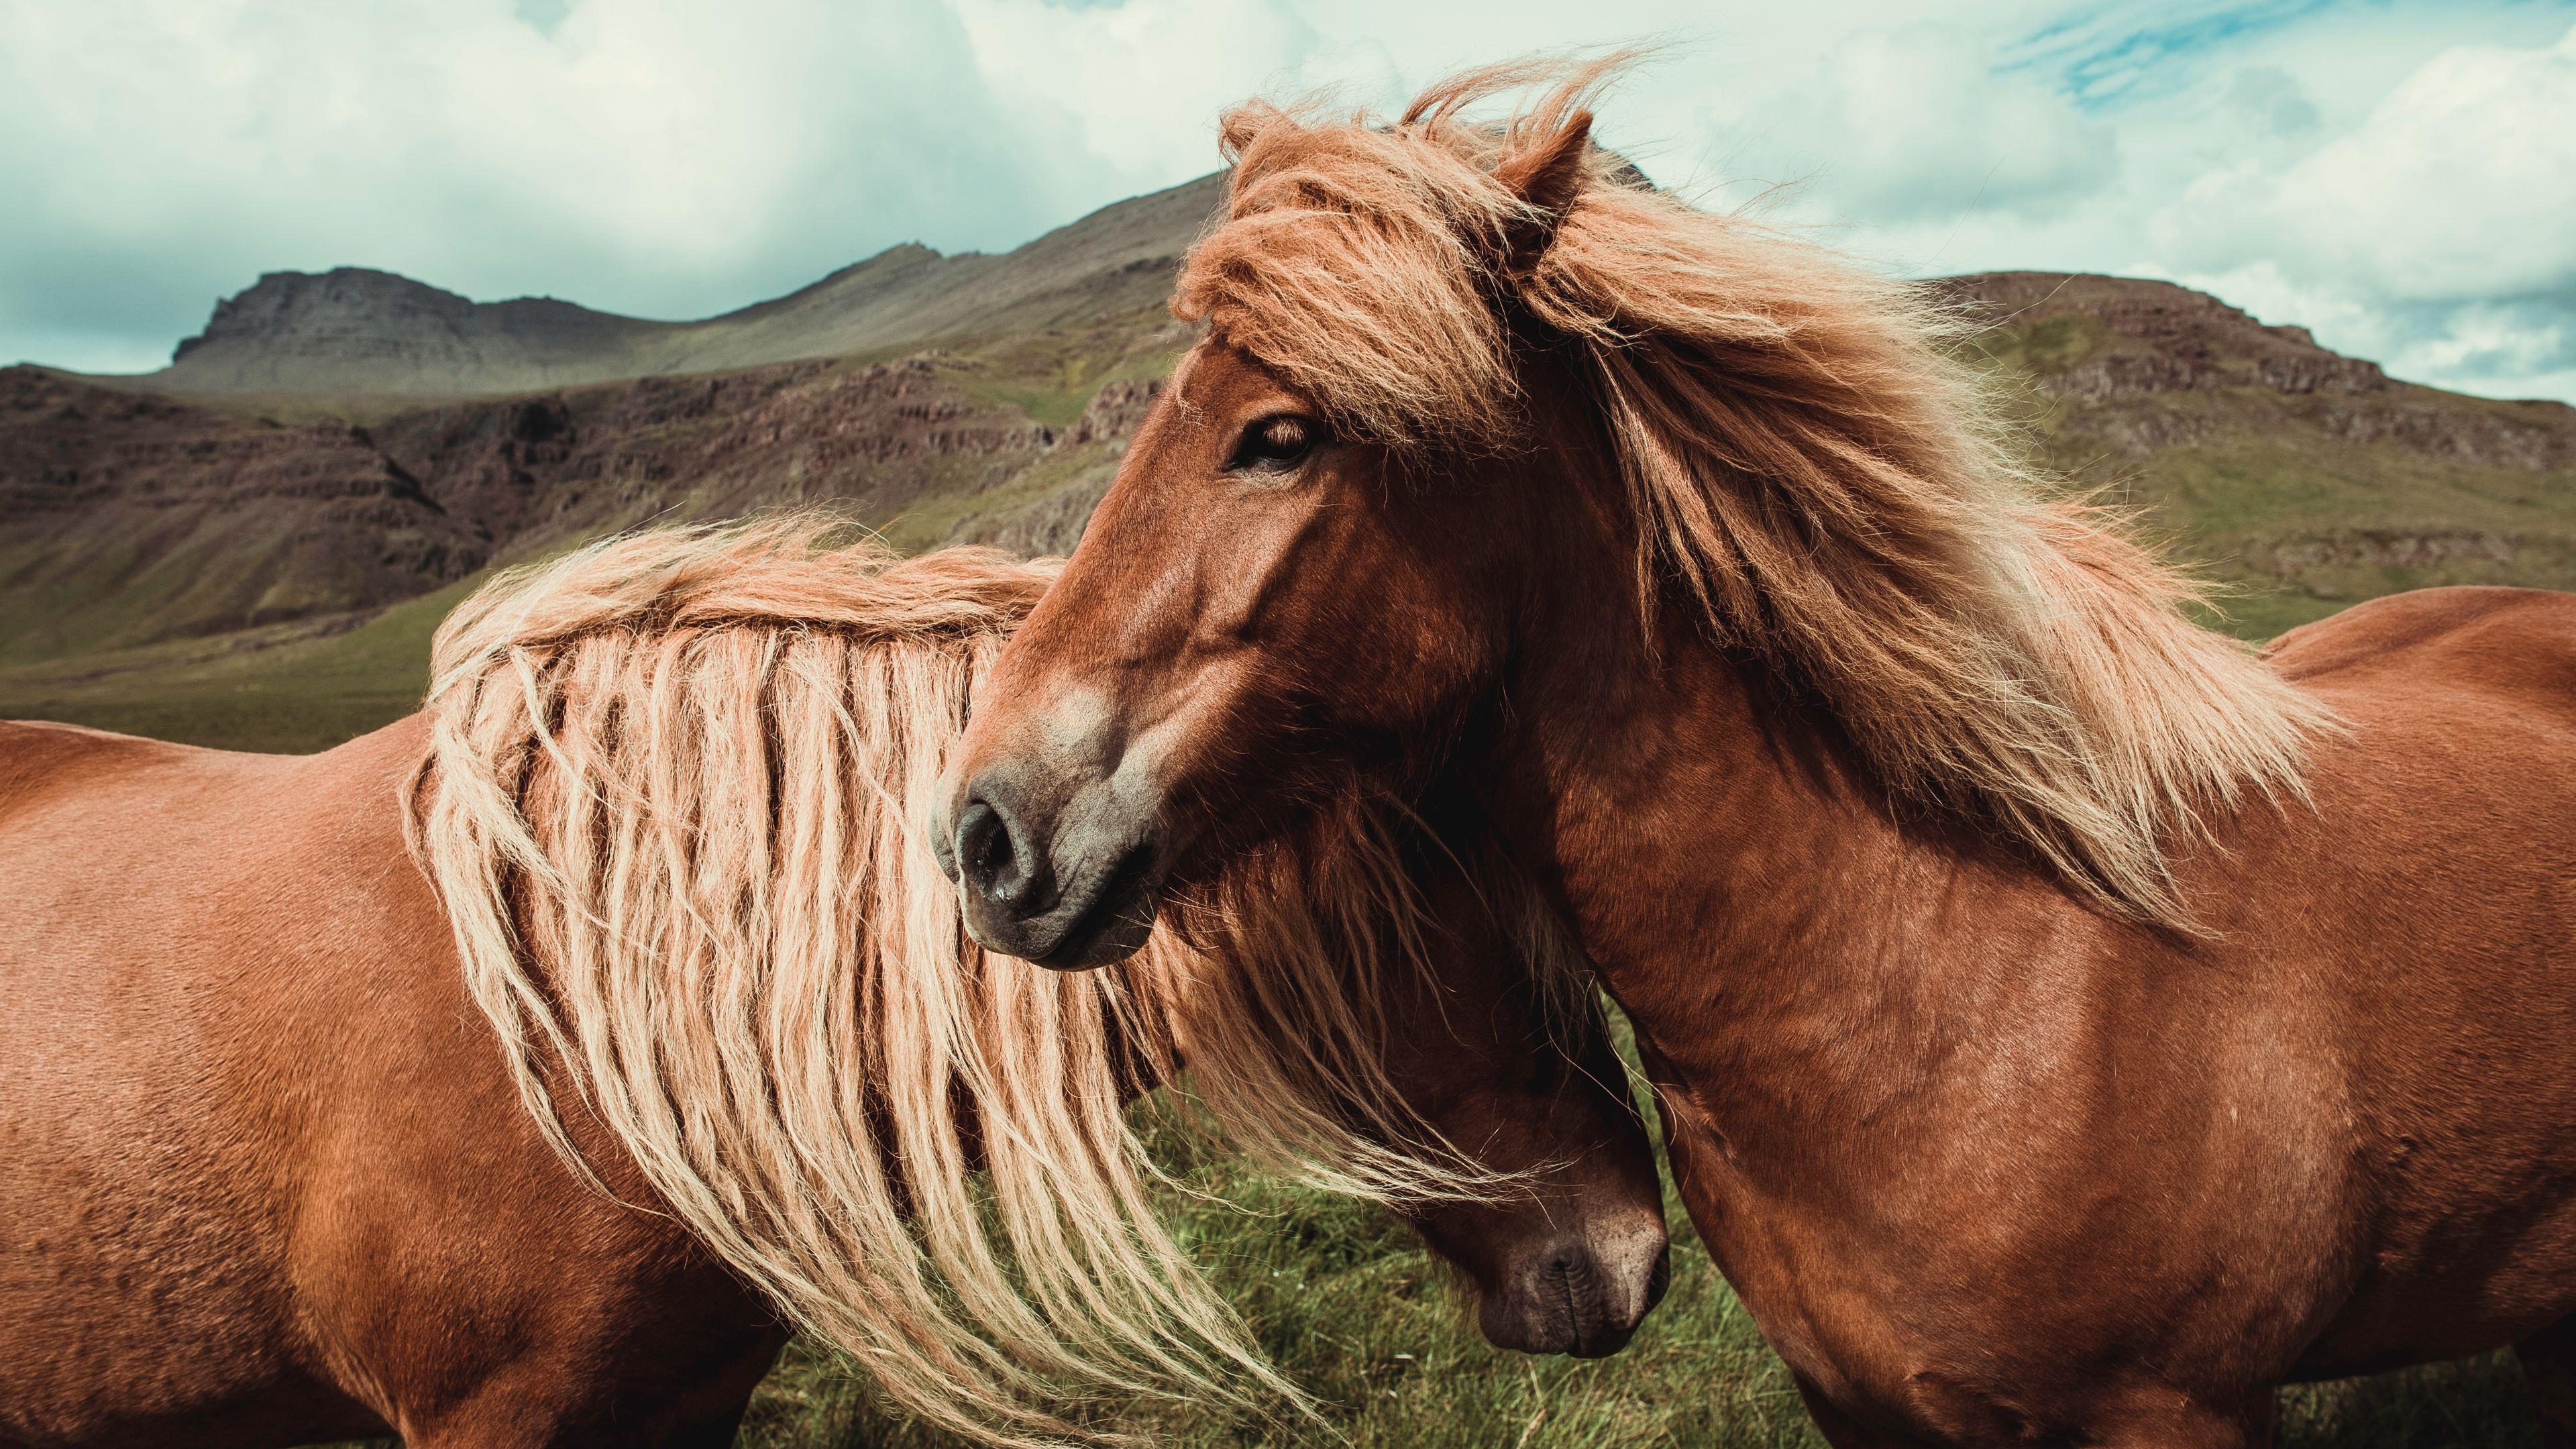 horses 4k 1542239369 - Horses 4k - horses wallpapers, horse wallpapers, hd-wallpapers, animals wallpapers, 4k-wallpapers